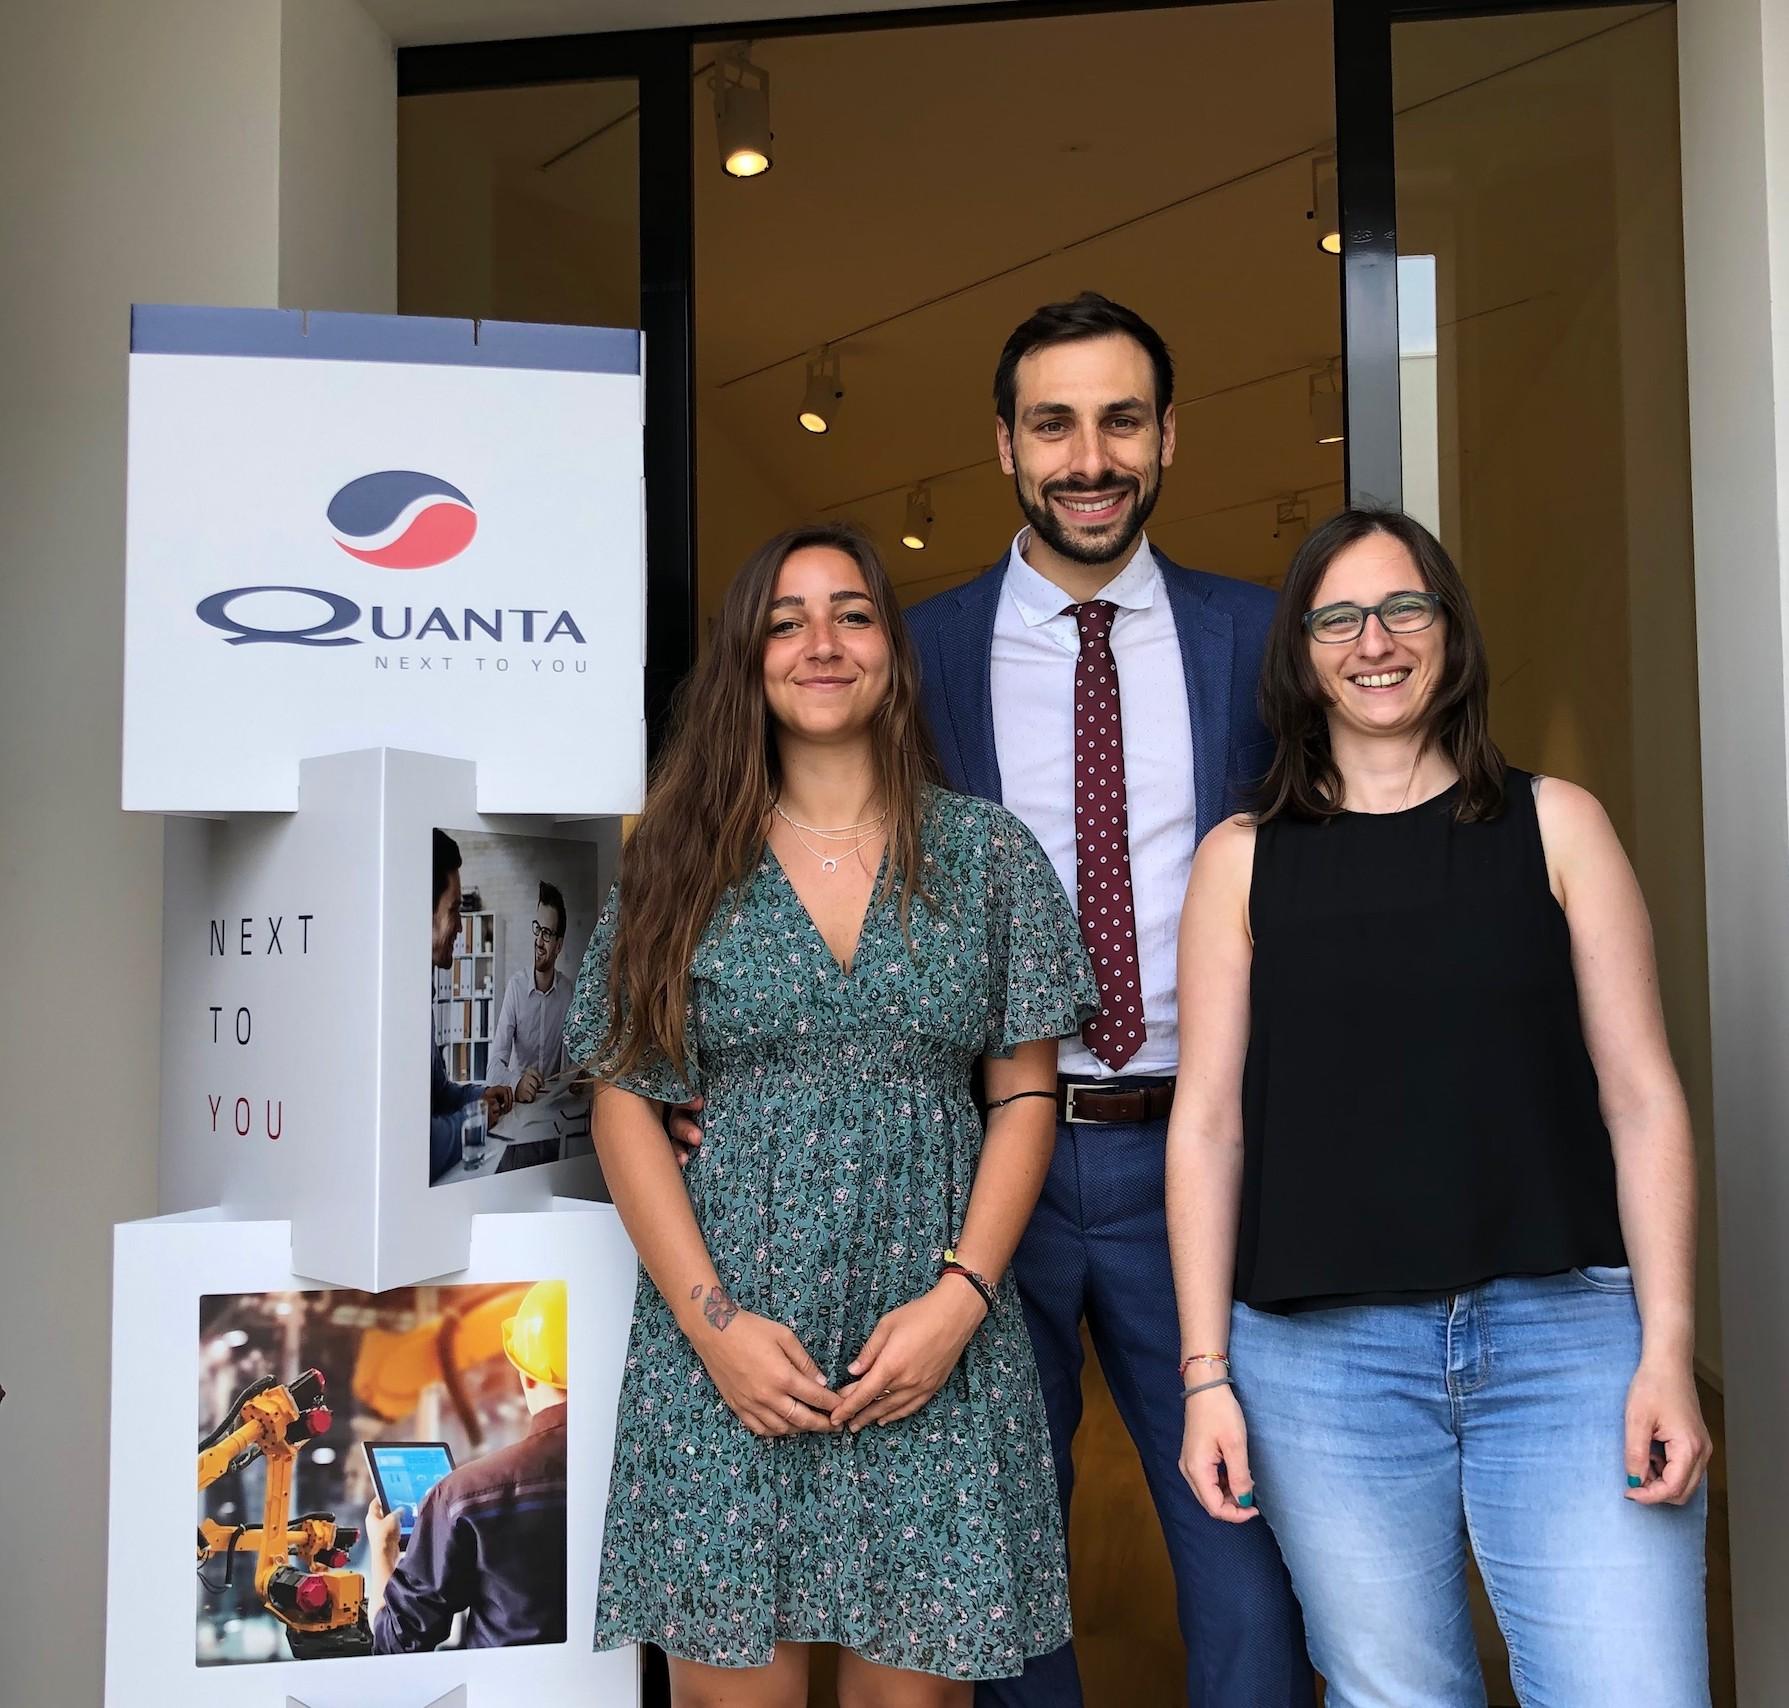 Quanta_Padova_team